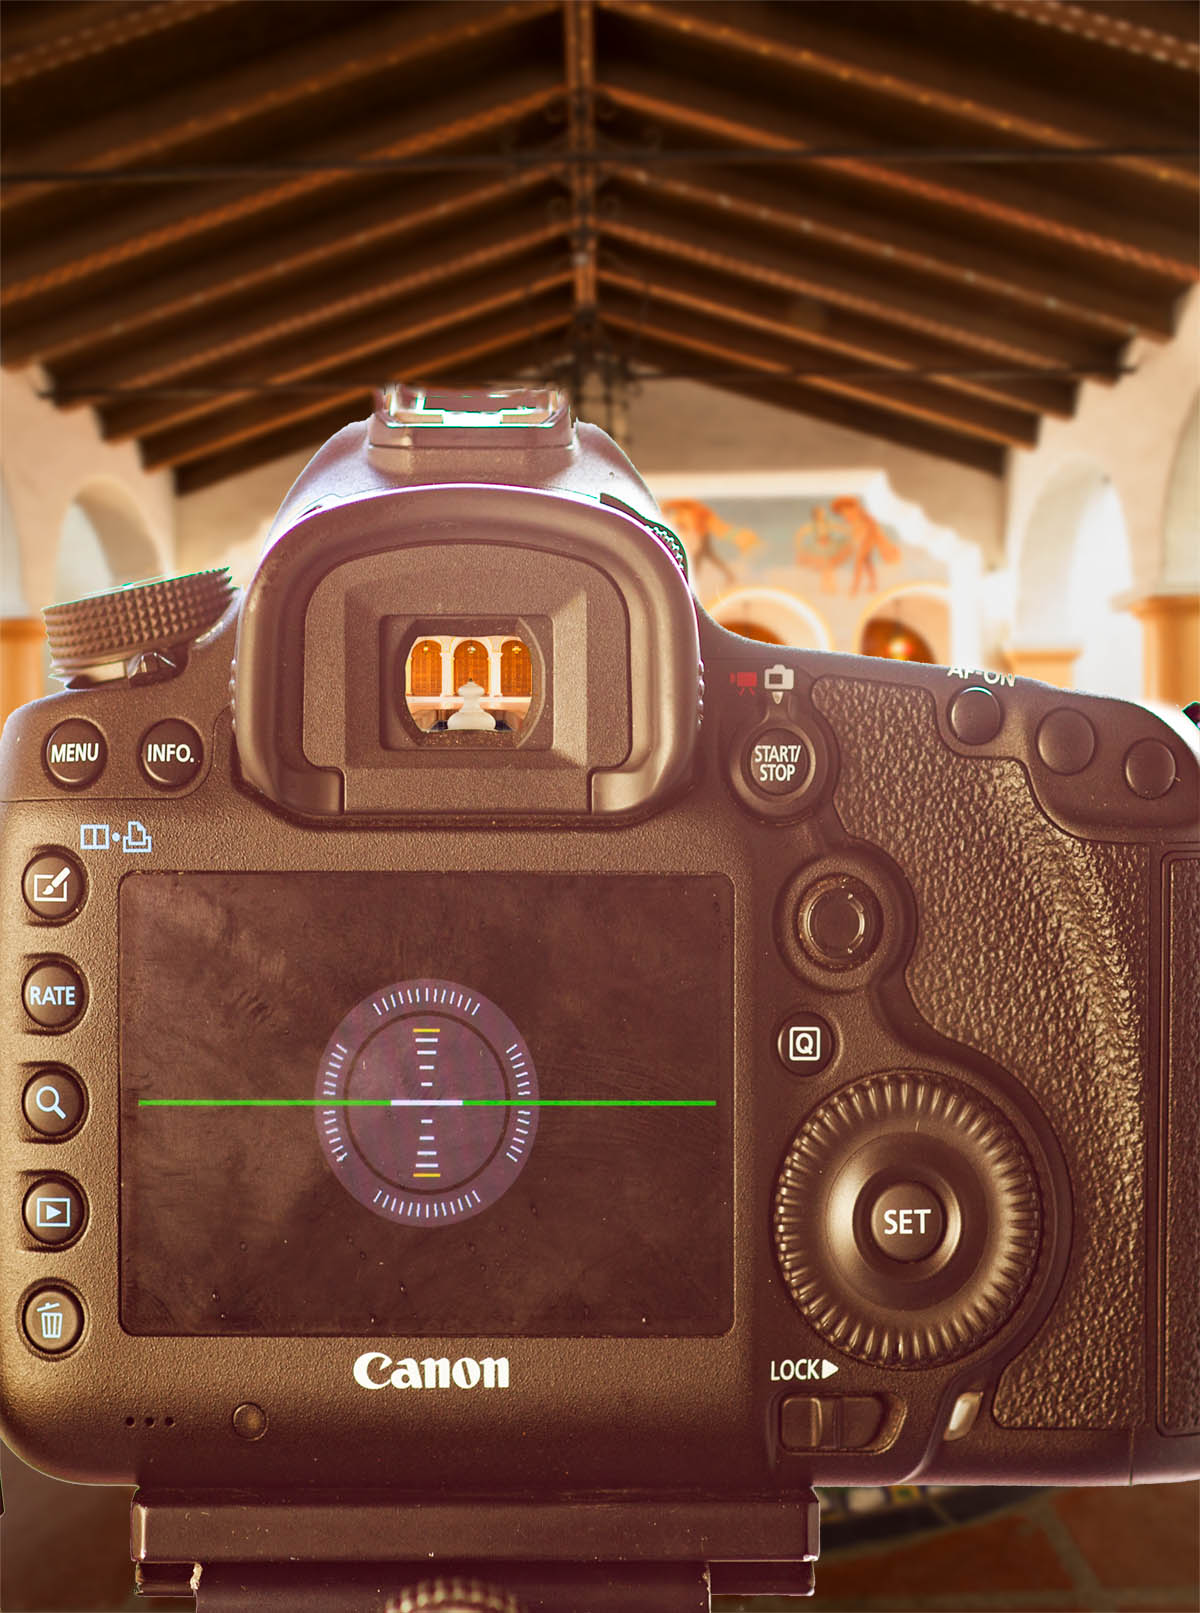 Built in camera level